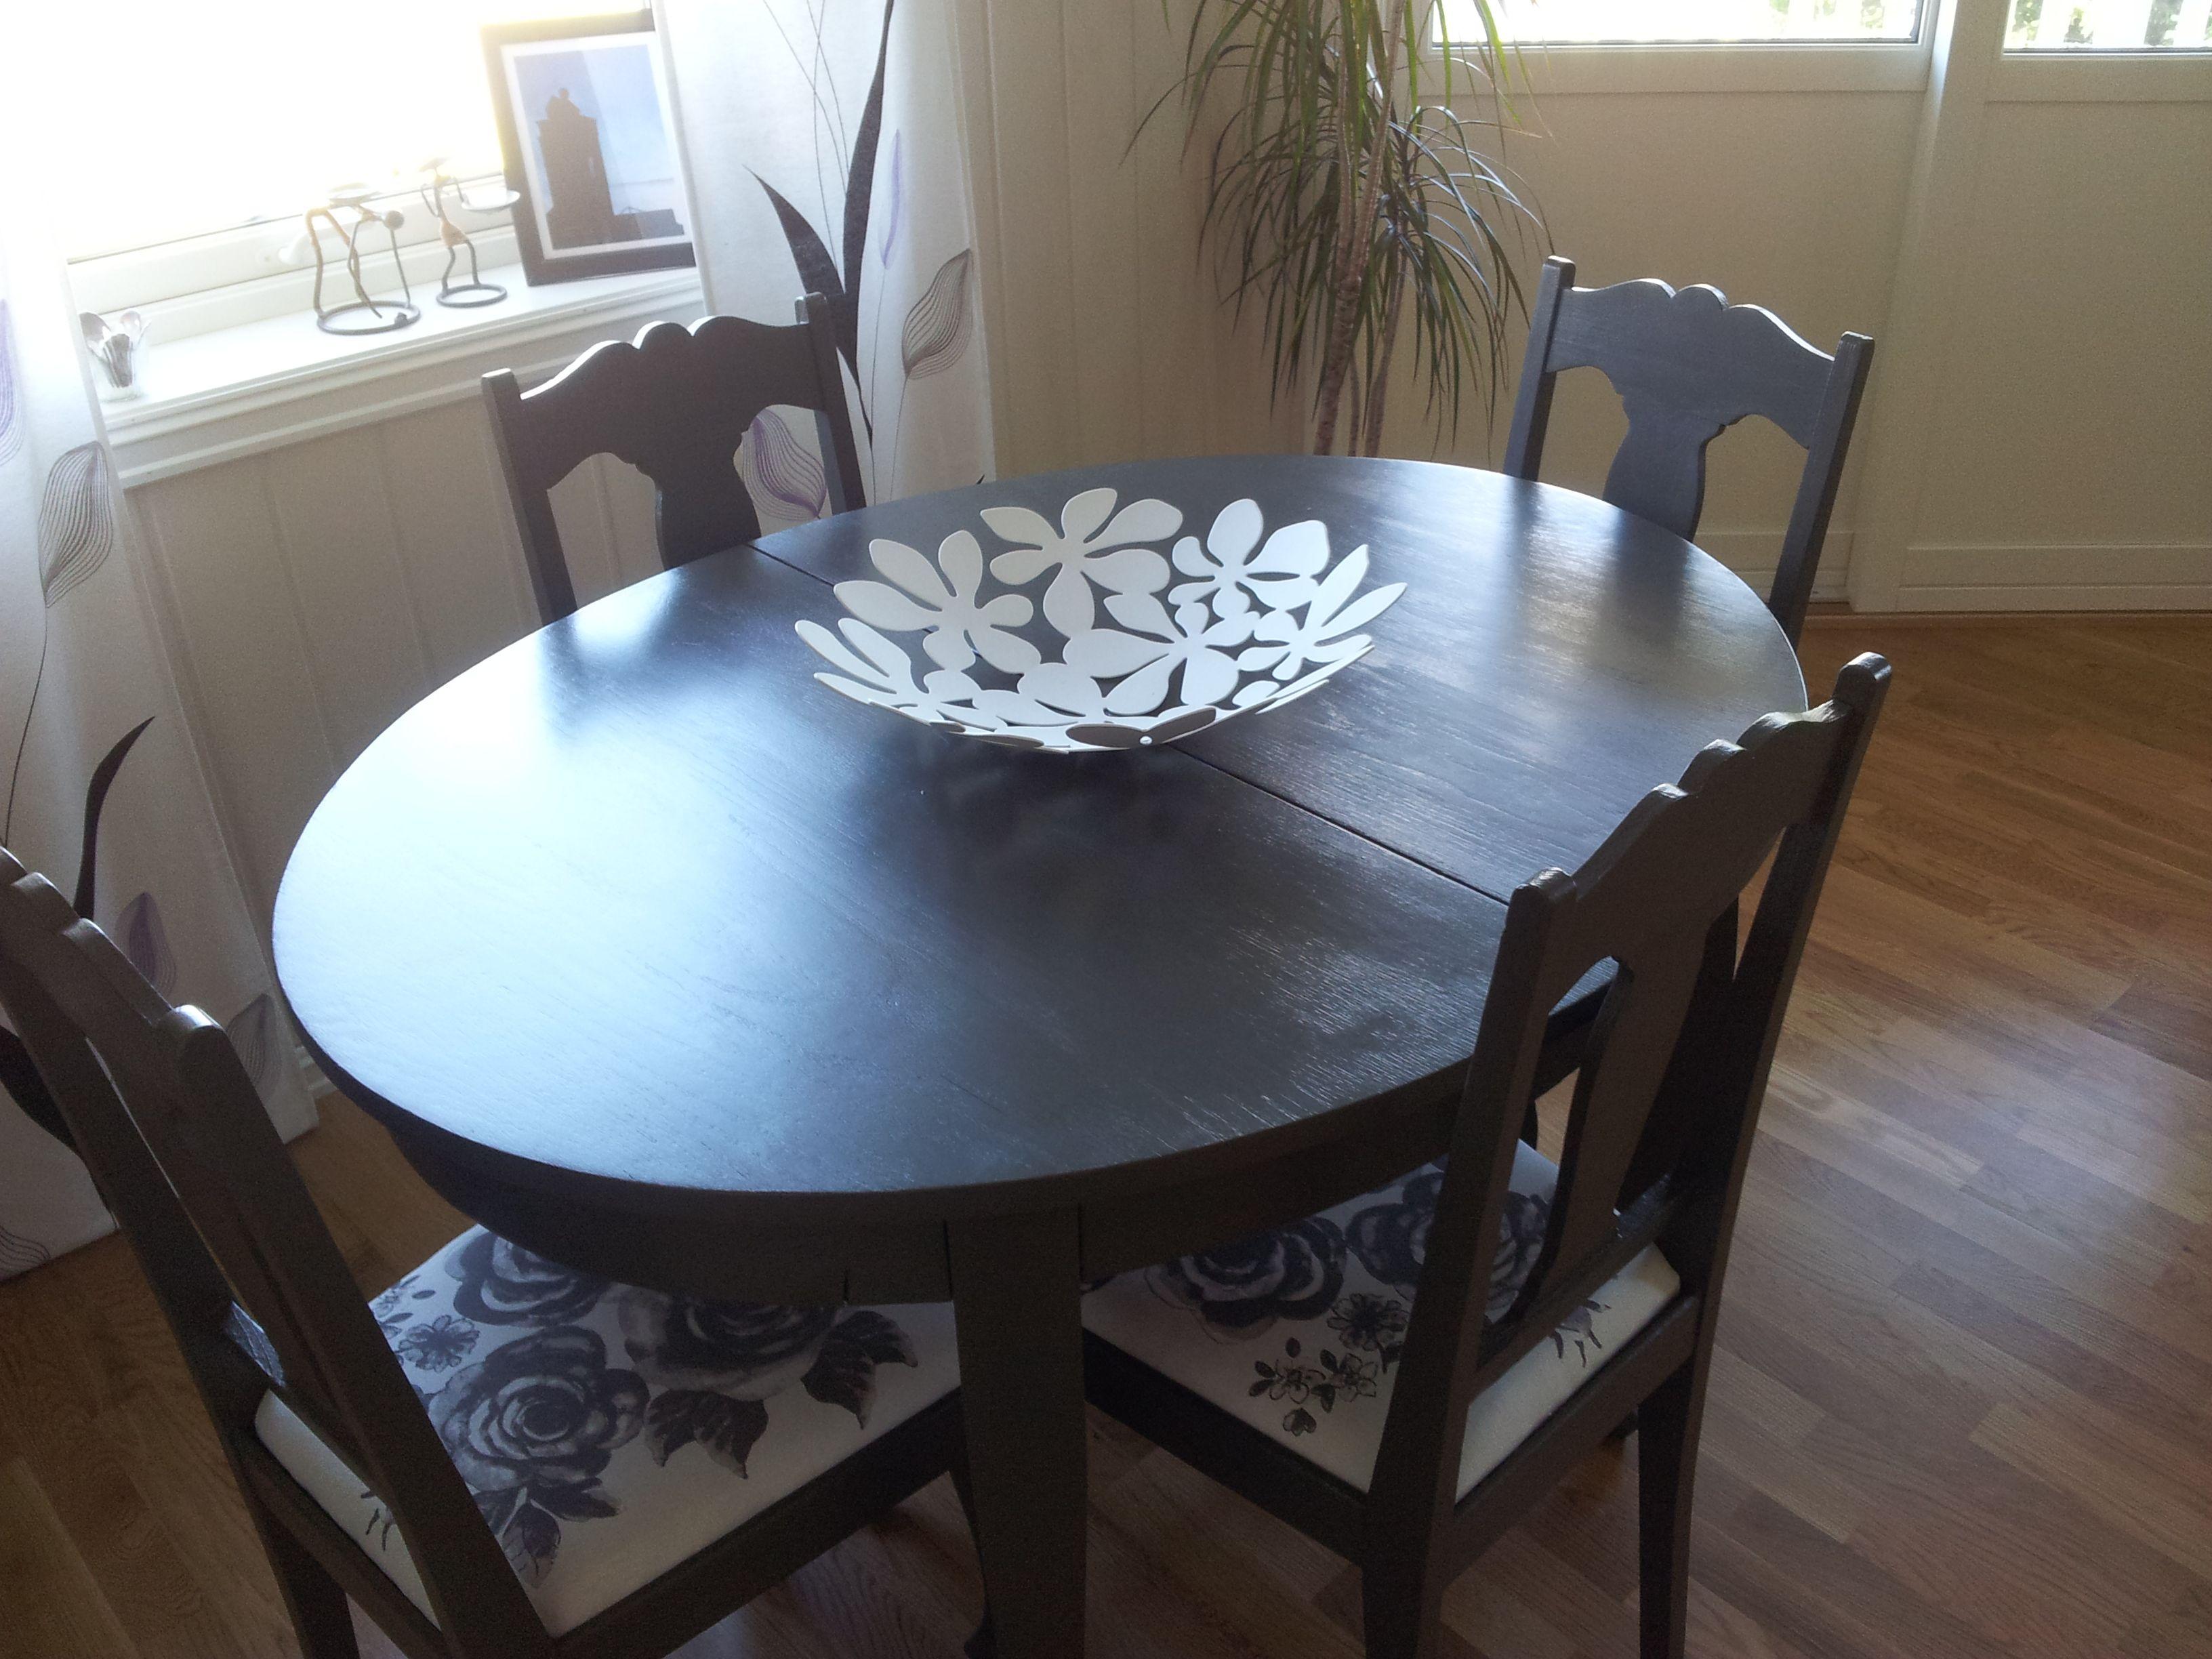 Kjøpte gammel og sjarmerende spisestue og malte den i fargen Elegant 1434 S7502 - Y. Fatet og blomstrete tekstilstoff er fra Ikea